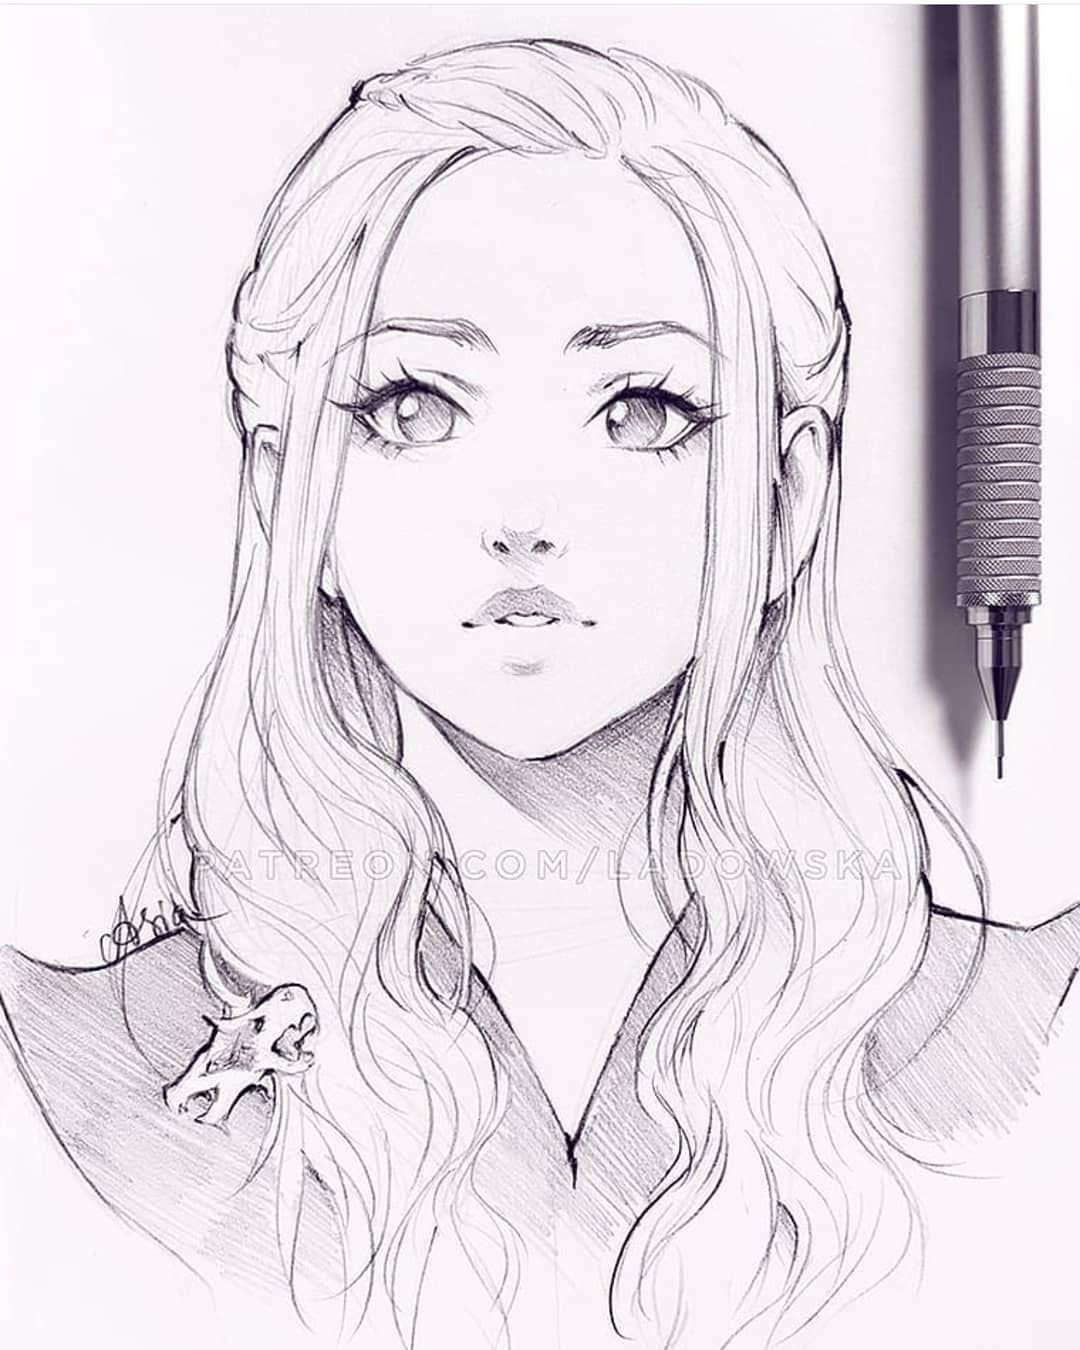 Daenerys Targaryen Khaleesi Game Of Thrones Anime Drawings Sketches Sketches Art Sketches